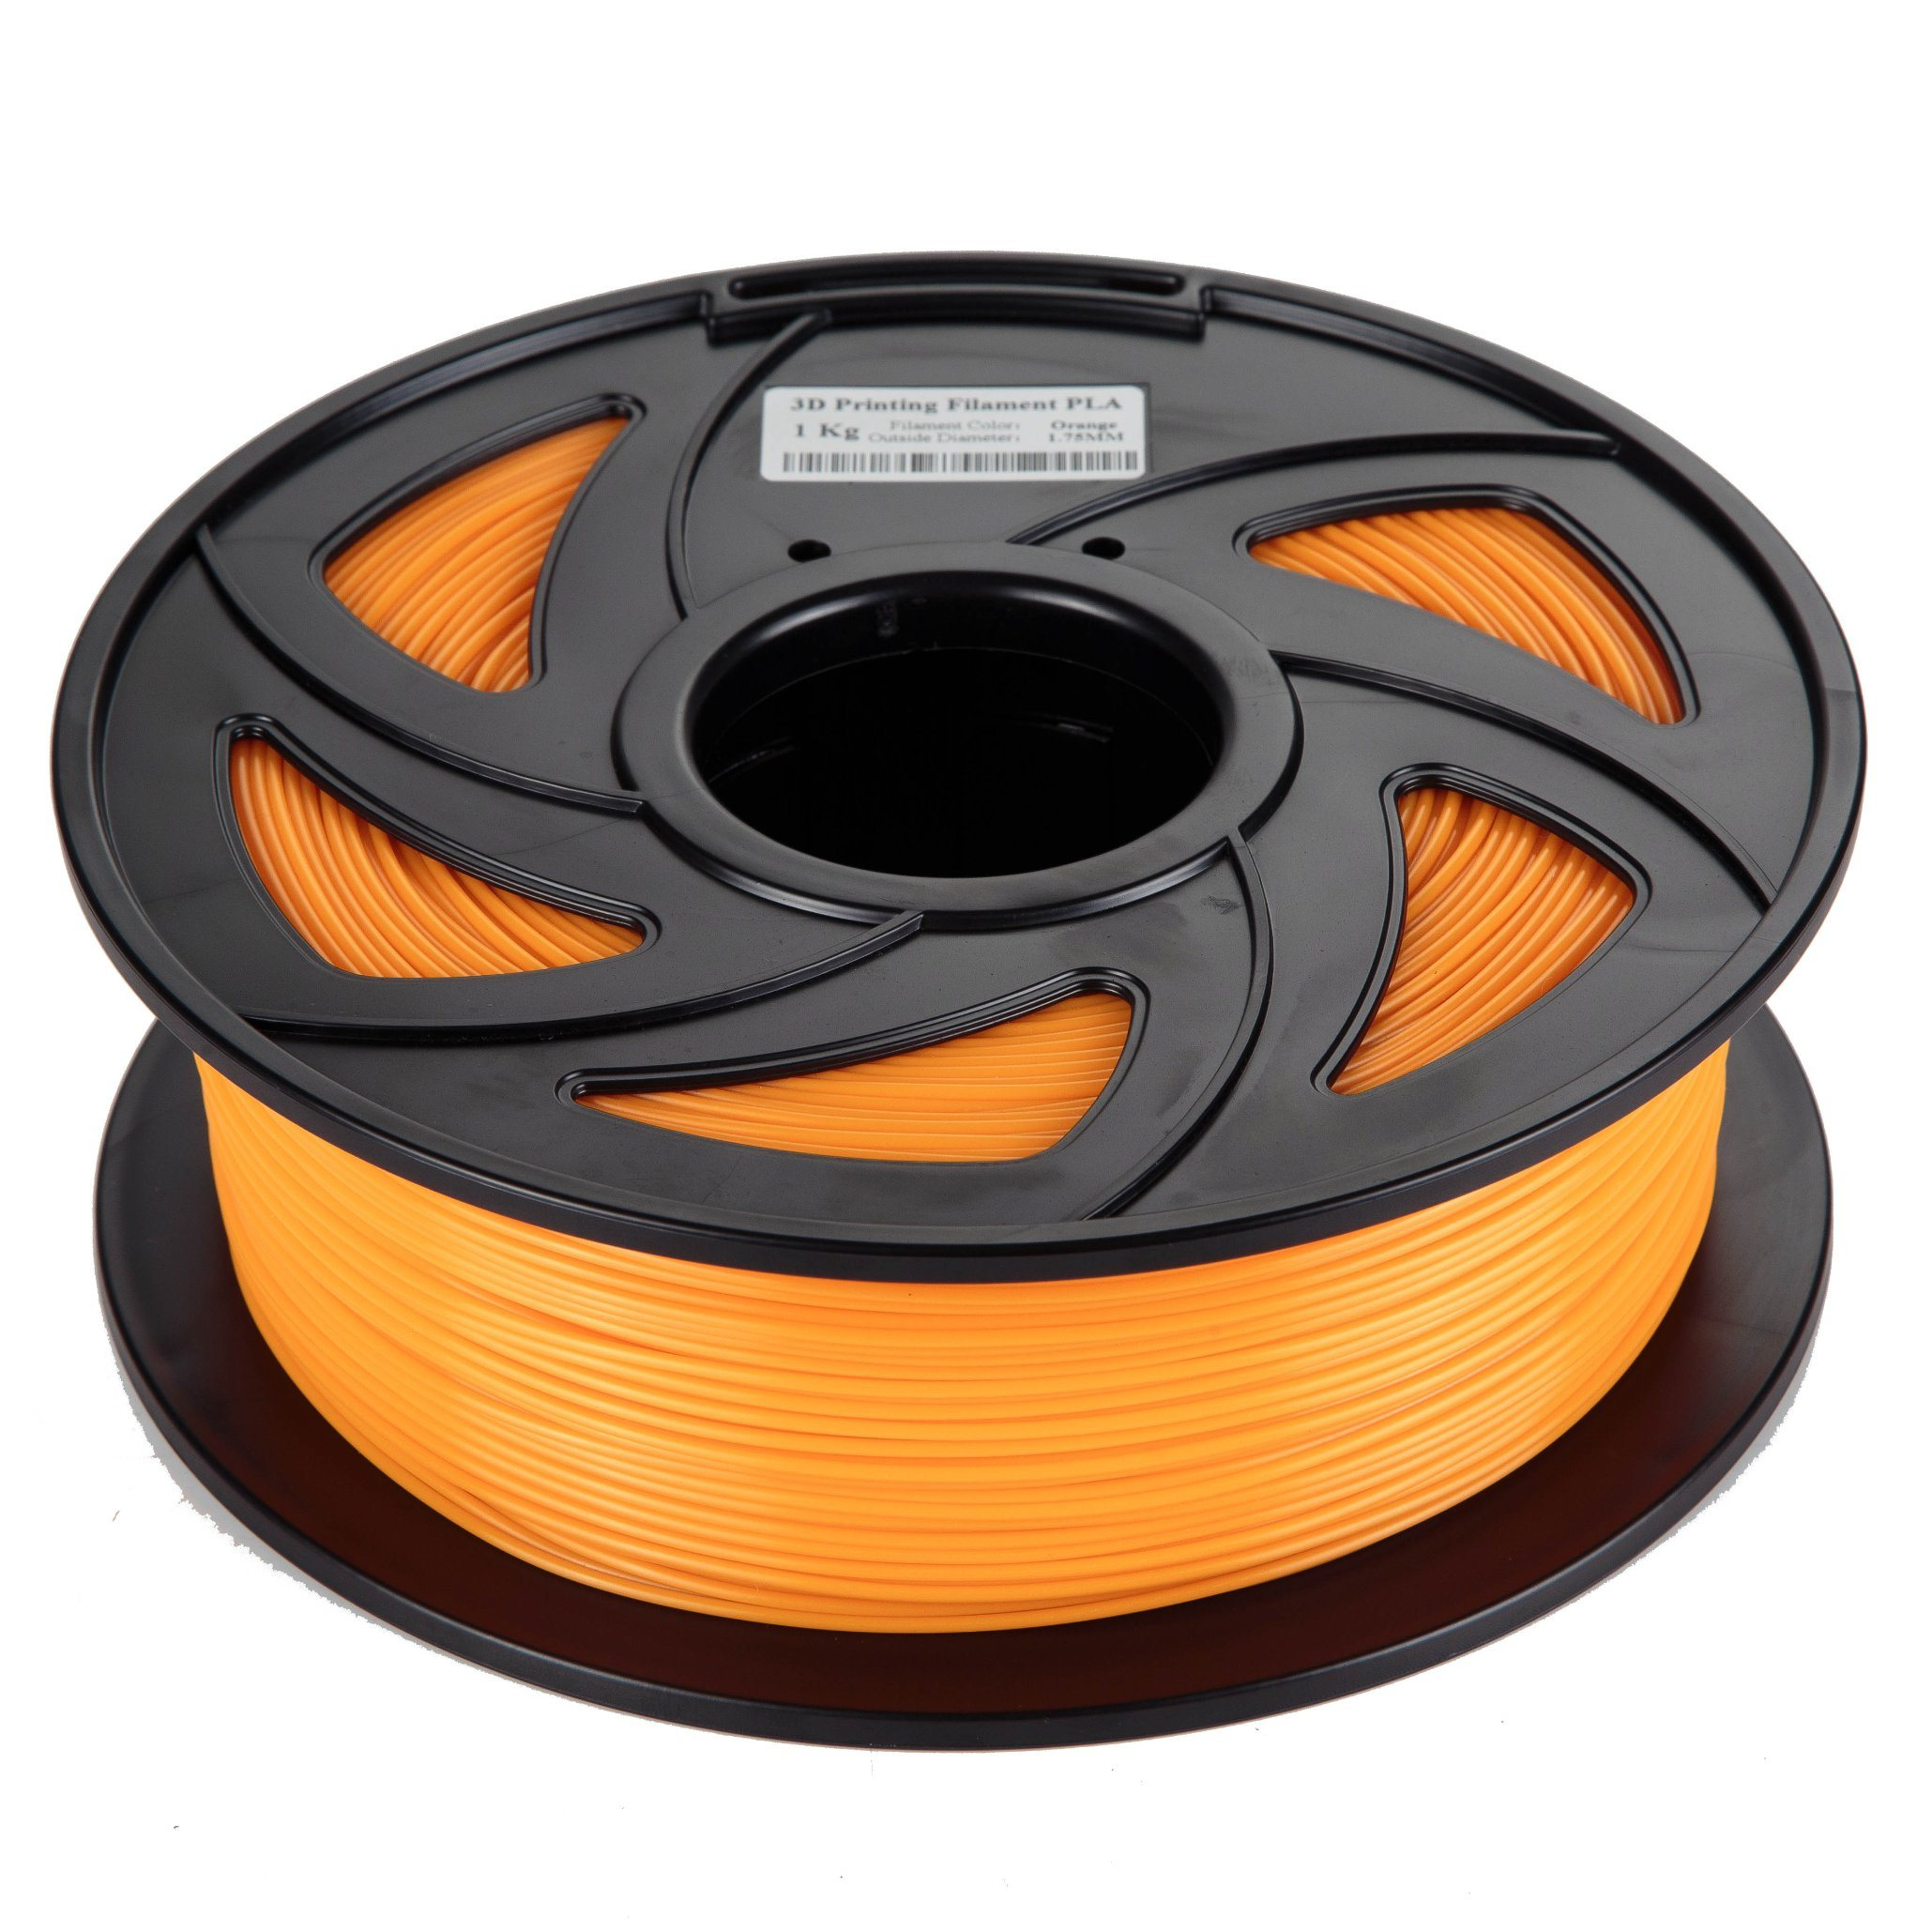 1Kg spool of YELLOW Premium quality PLA 3D printer filament 1.75mm suitable for most 3D printers